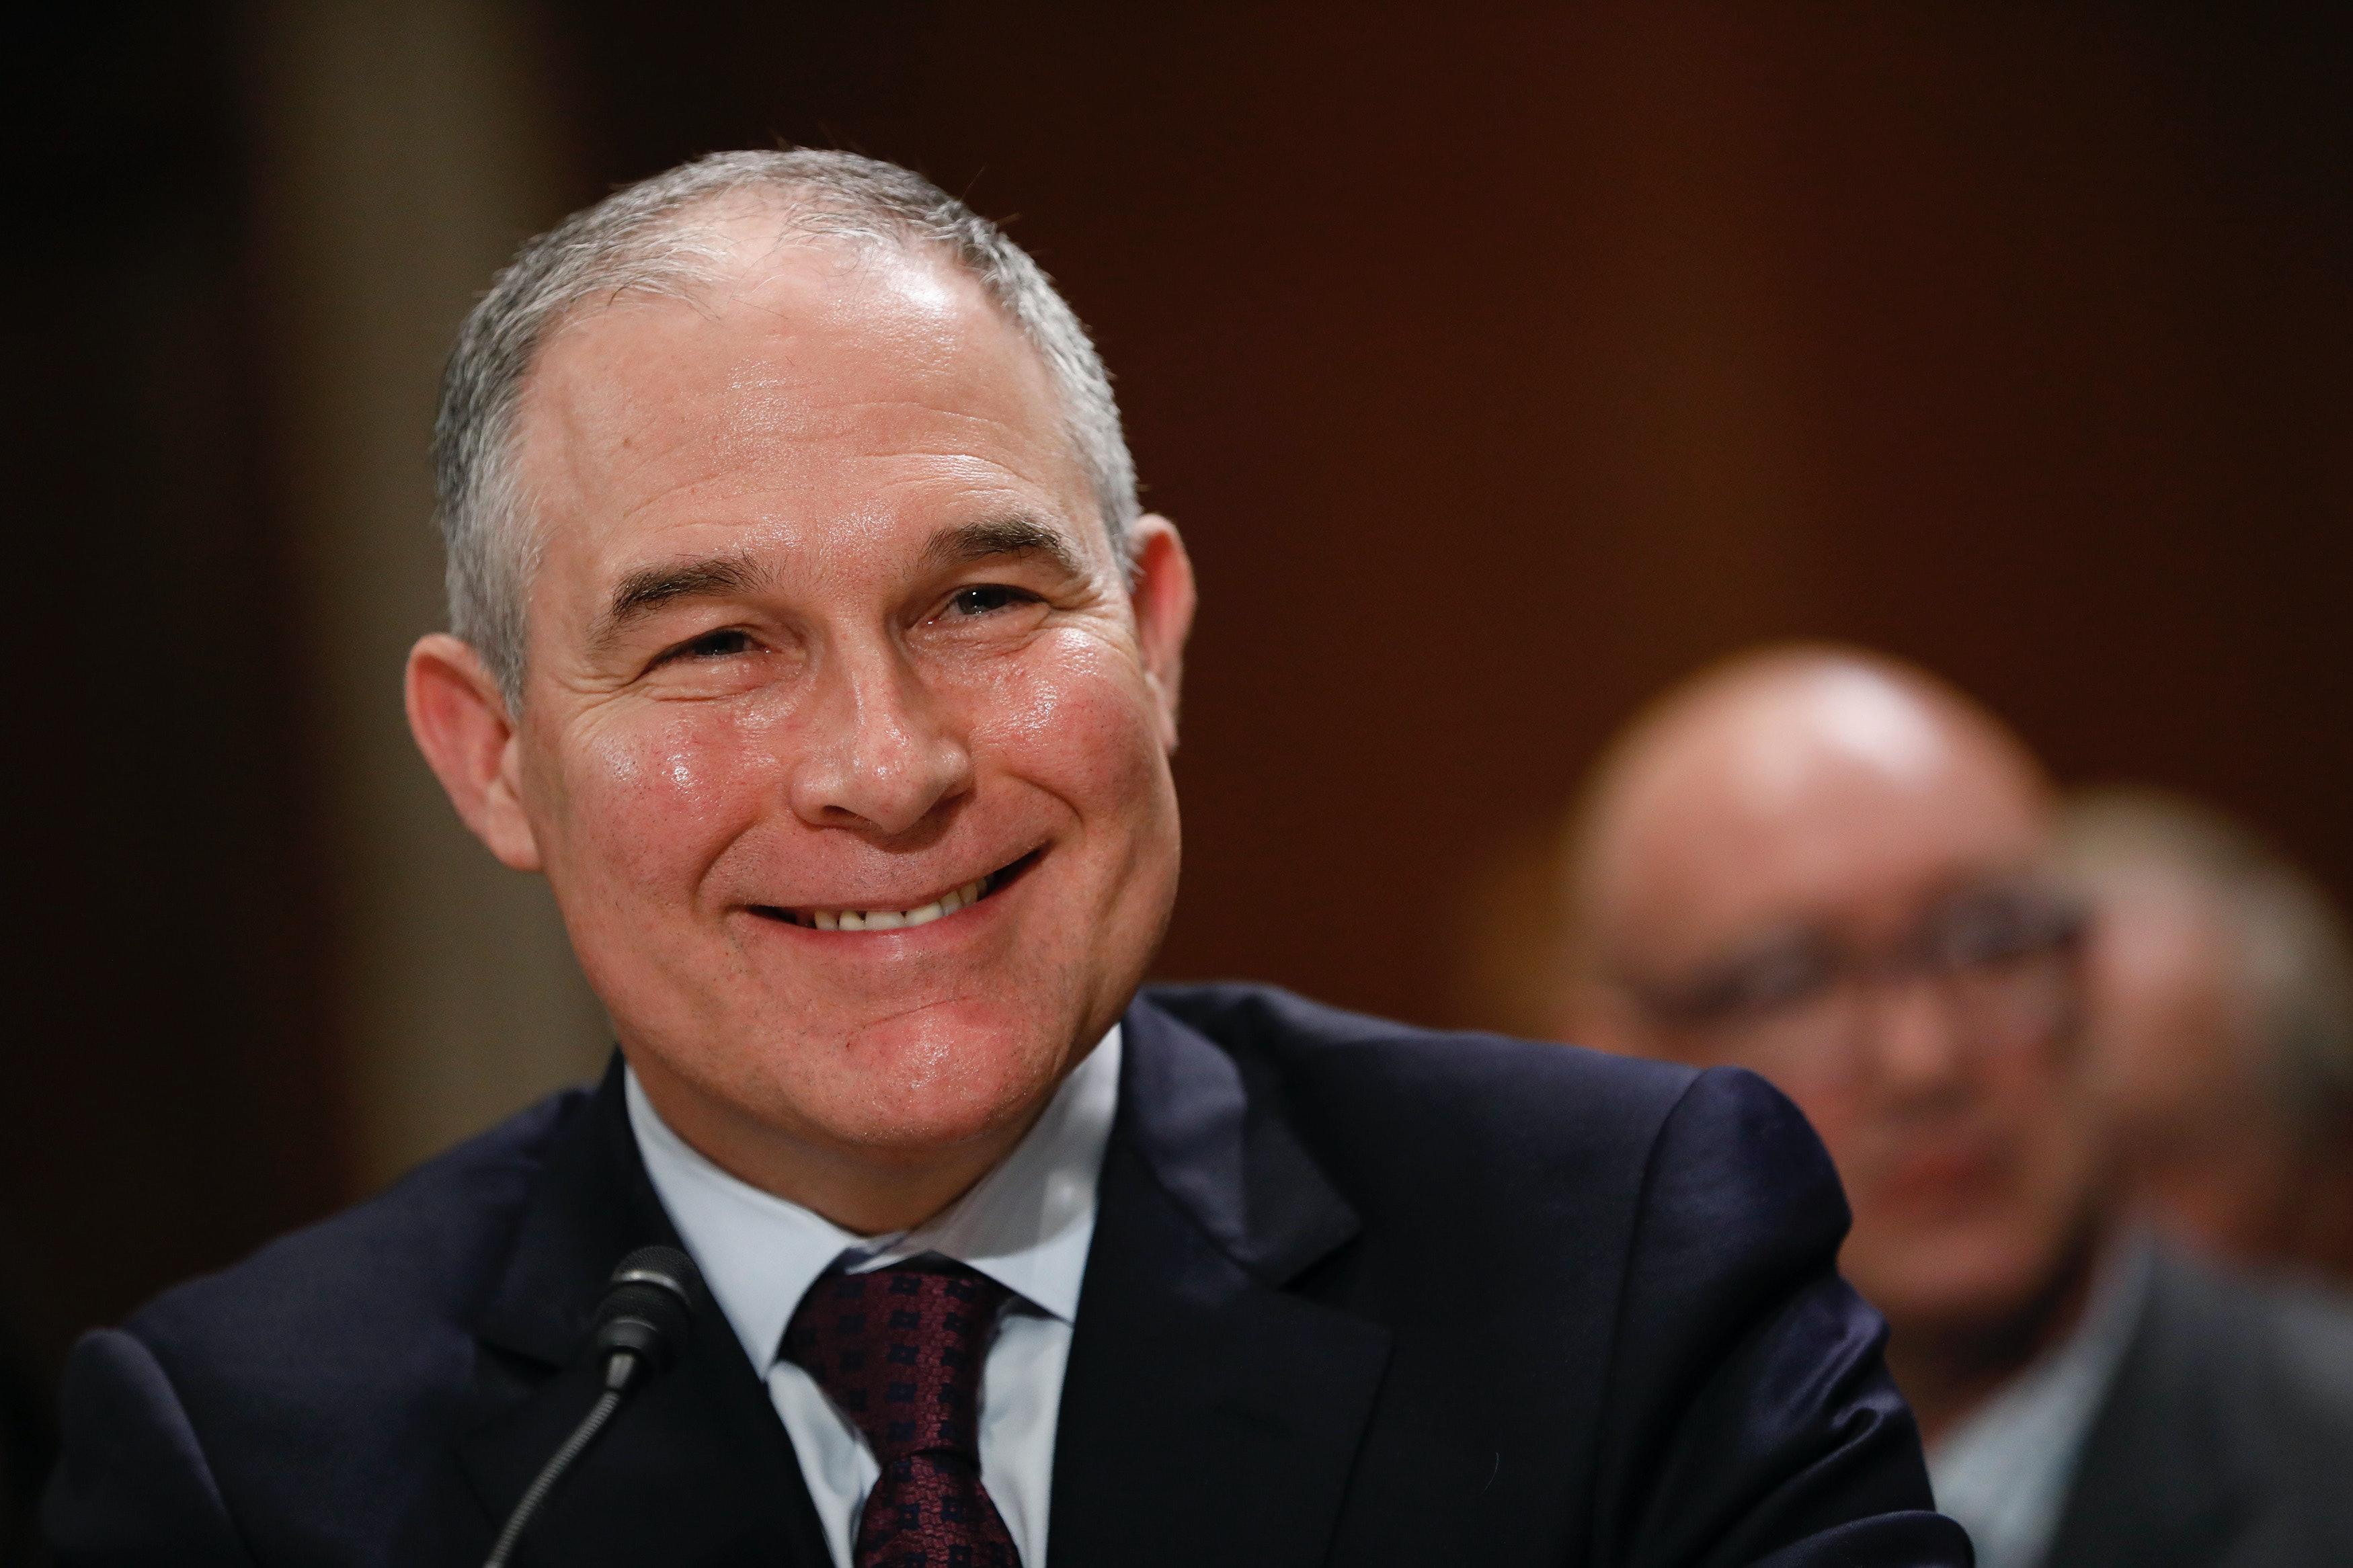 Senate Republicans Rush To Confirm Scott Pruitt For EPA, Bypassing Court Order